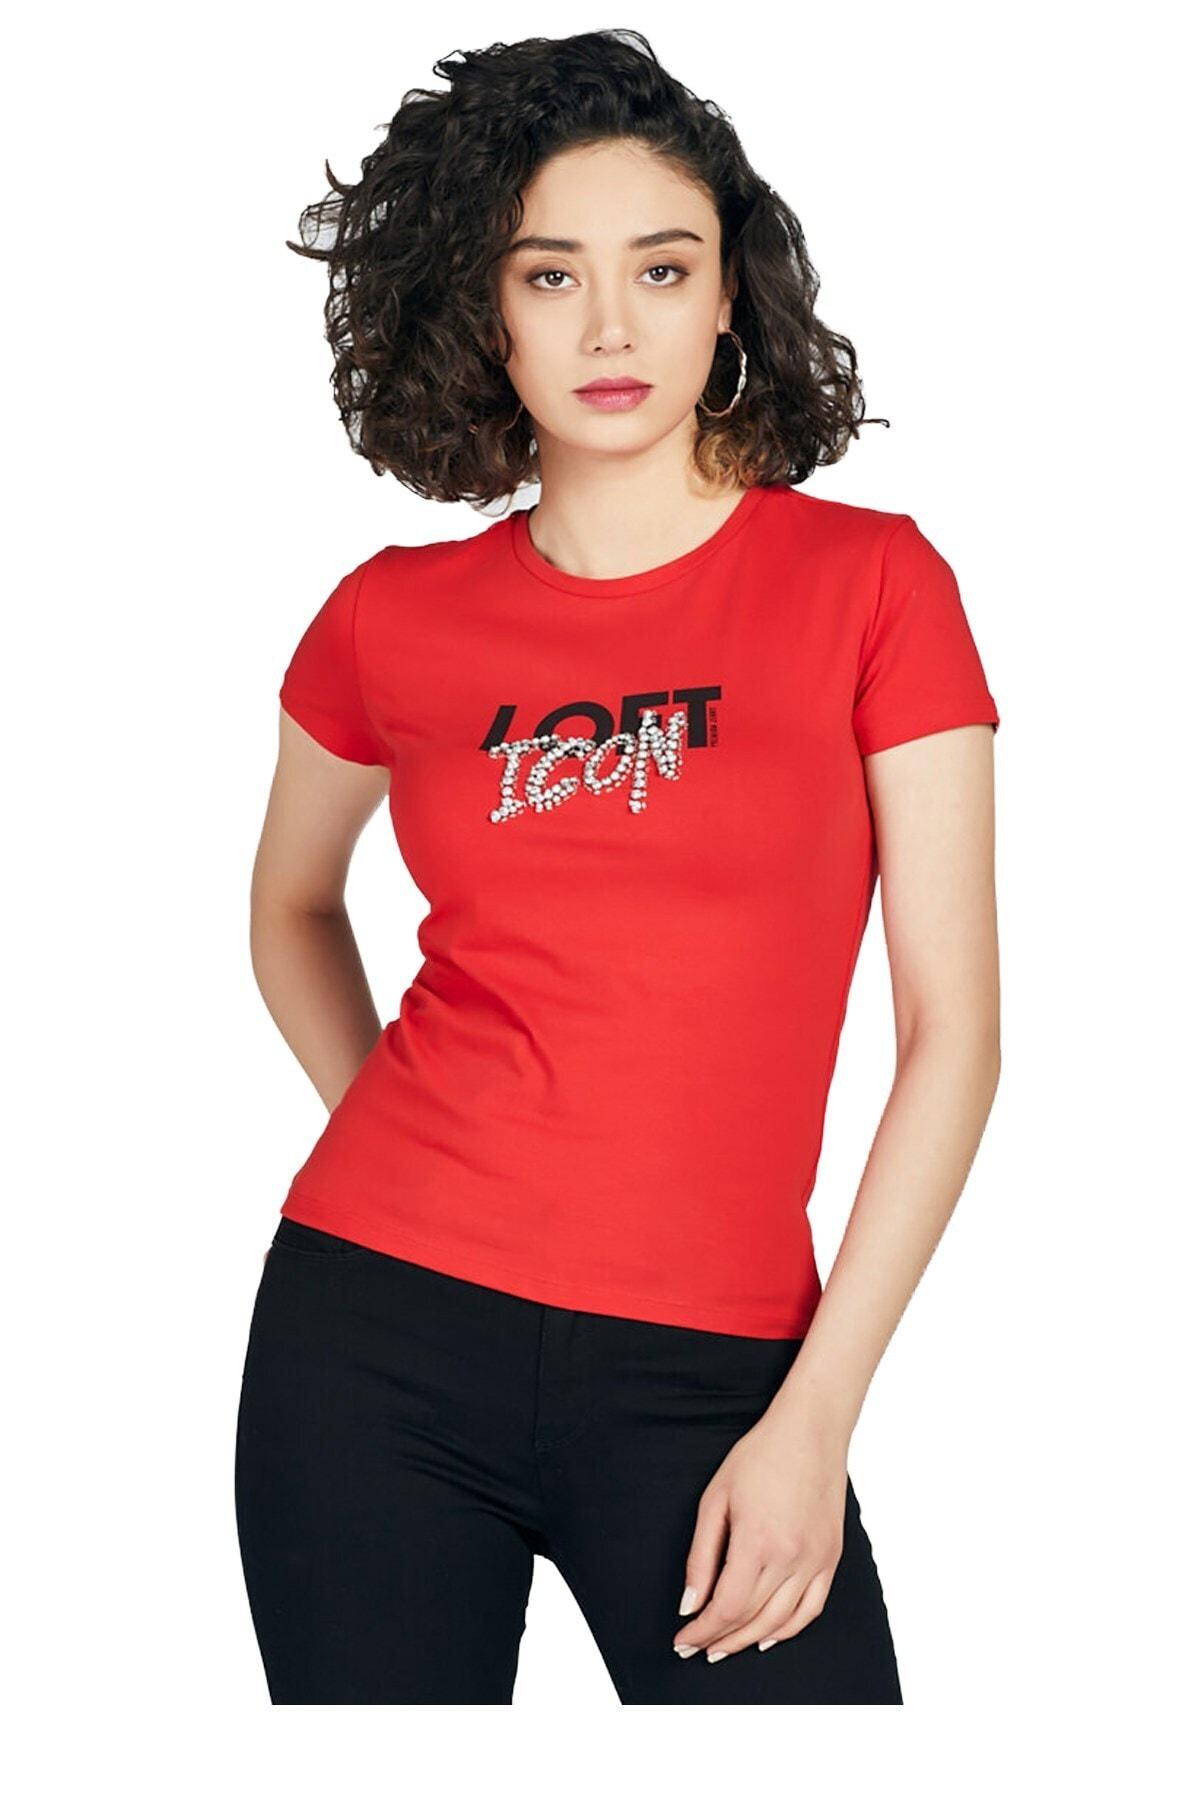 Kadın Tişört Lf2027191